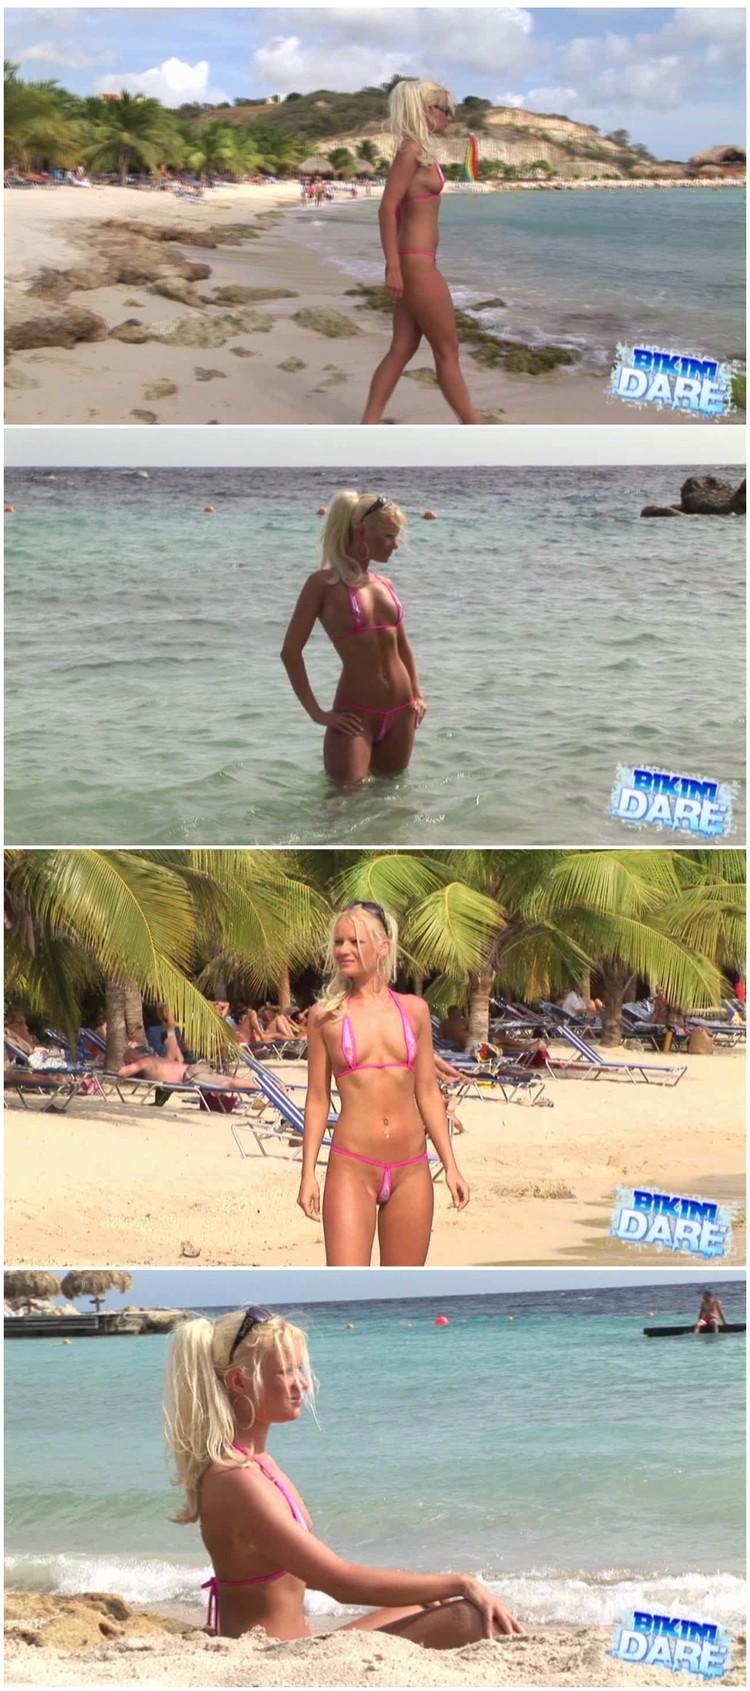 bikini-dare064_cover_l.jpg